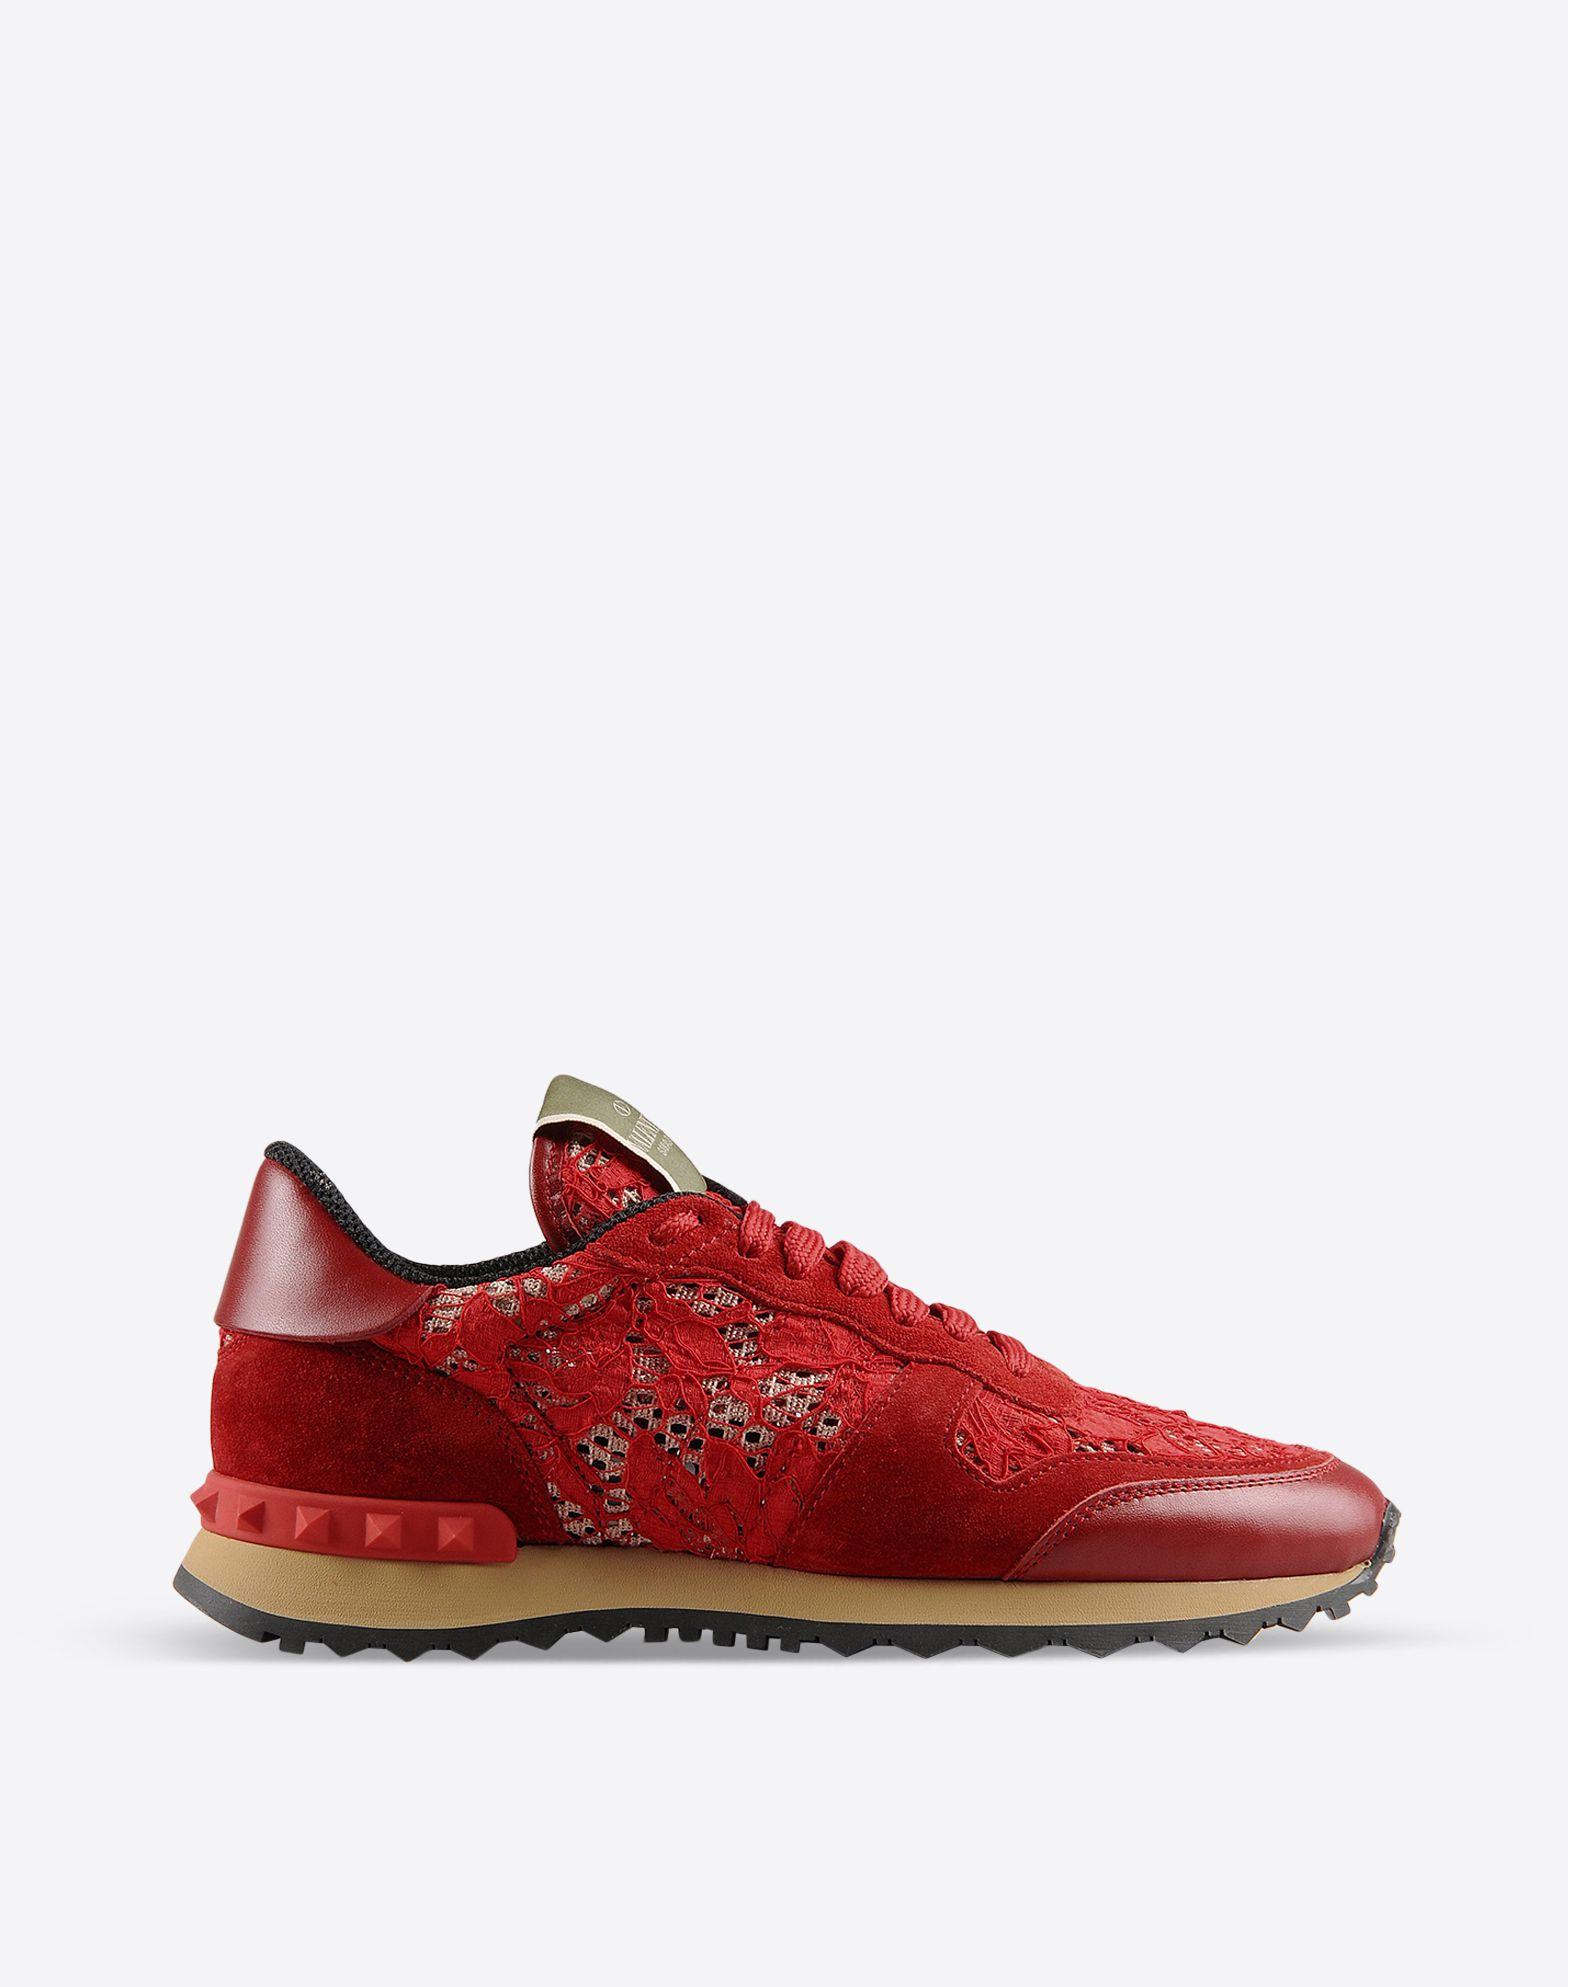 valentino garavani rockrunner in macram lace sneakers for women valentino online boutique. Black Bedroom Furniture Sets. Home Design Ideas